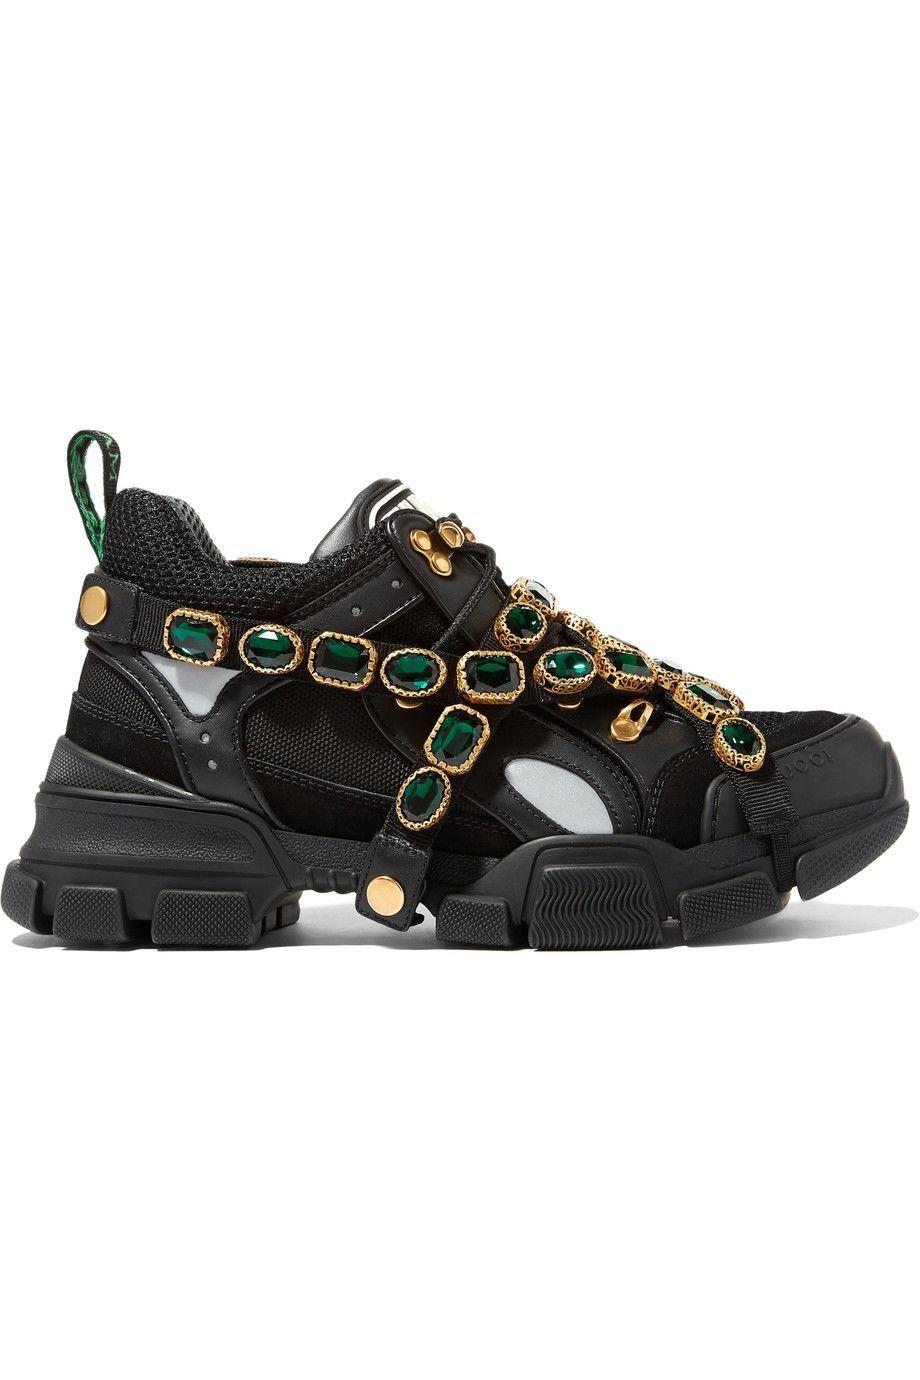 #PopbelaOOTD: Sepatu Glamor untuk Sehari-hari!